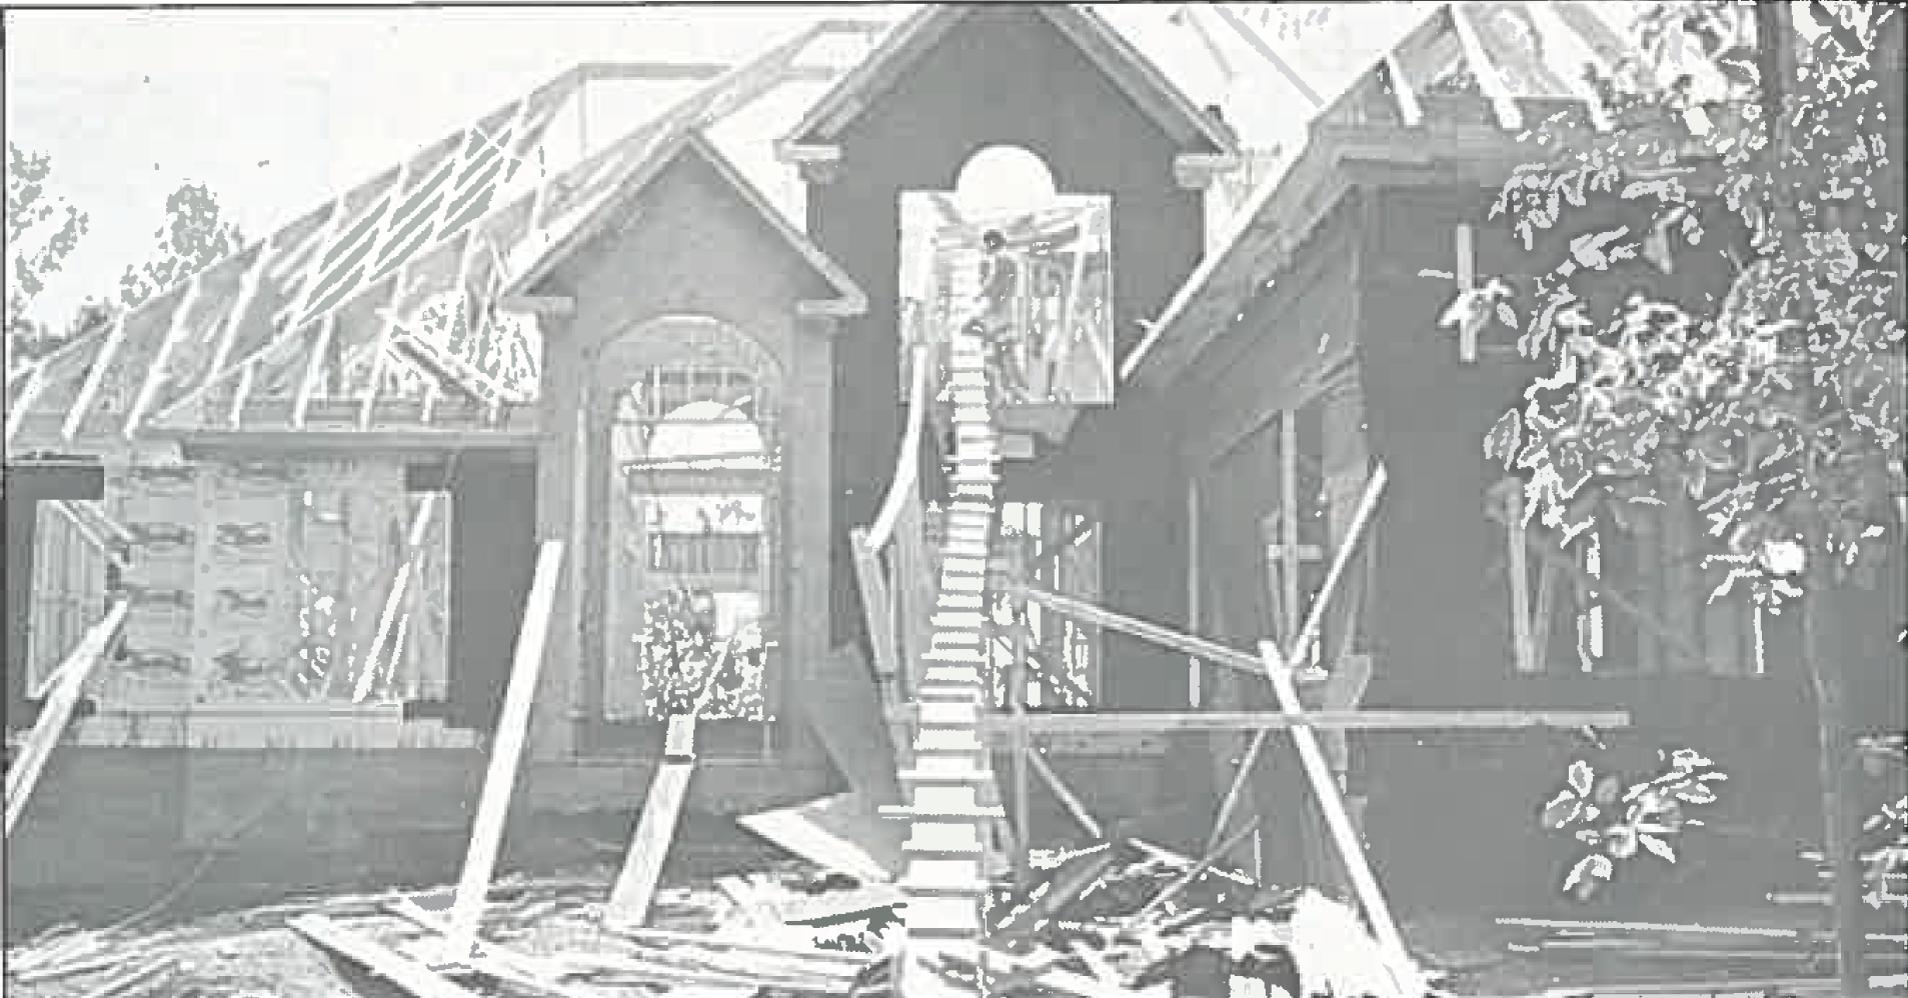 1992 Scholarship House